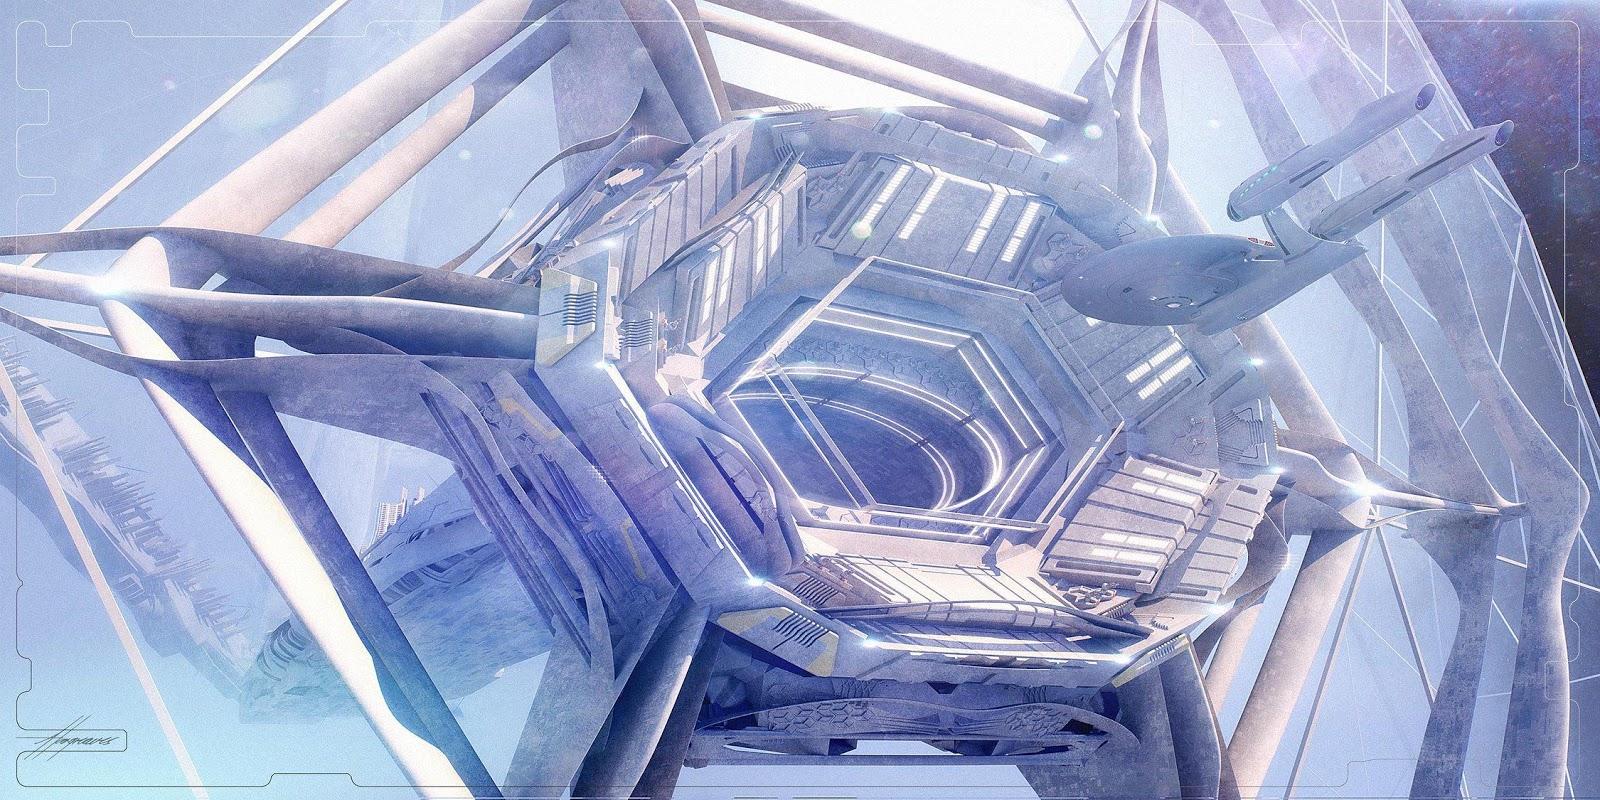 Sean Hargreaves Star Trek Beyond Starbase Yorktown doors concept art.jpg